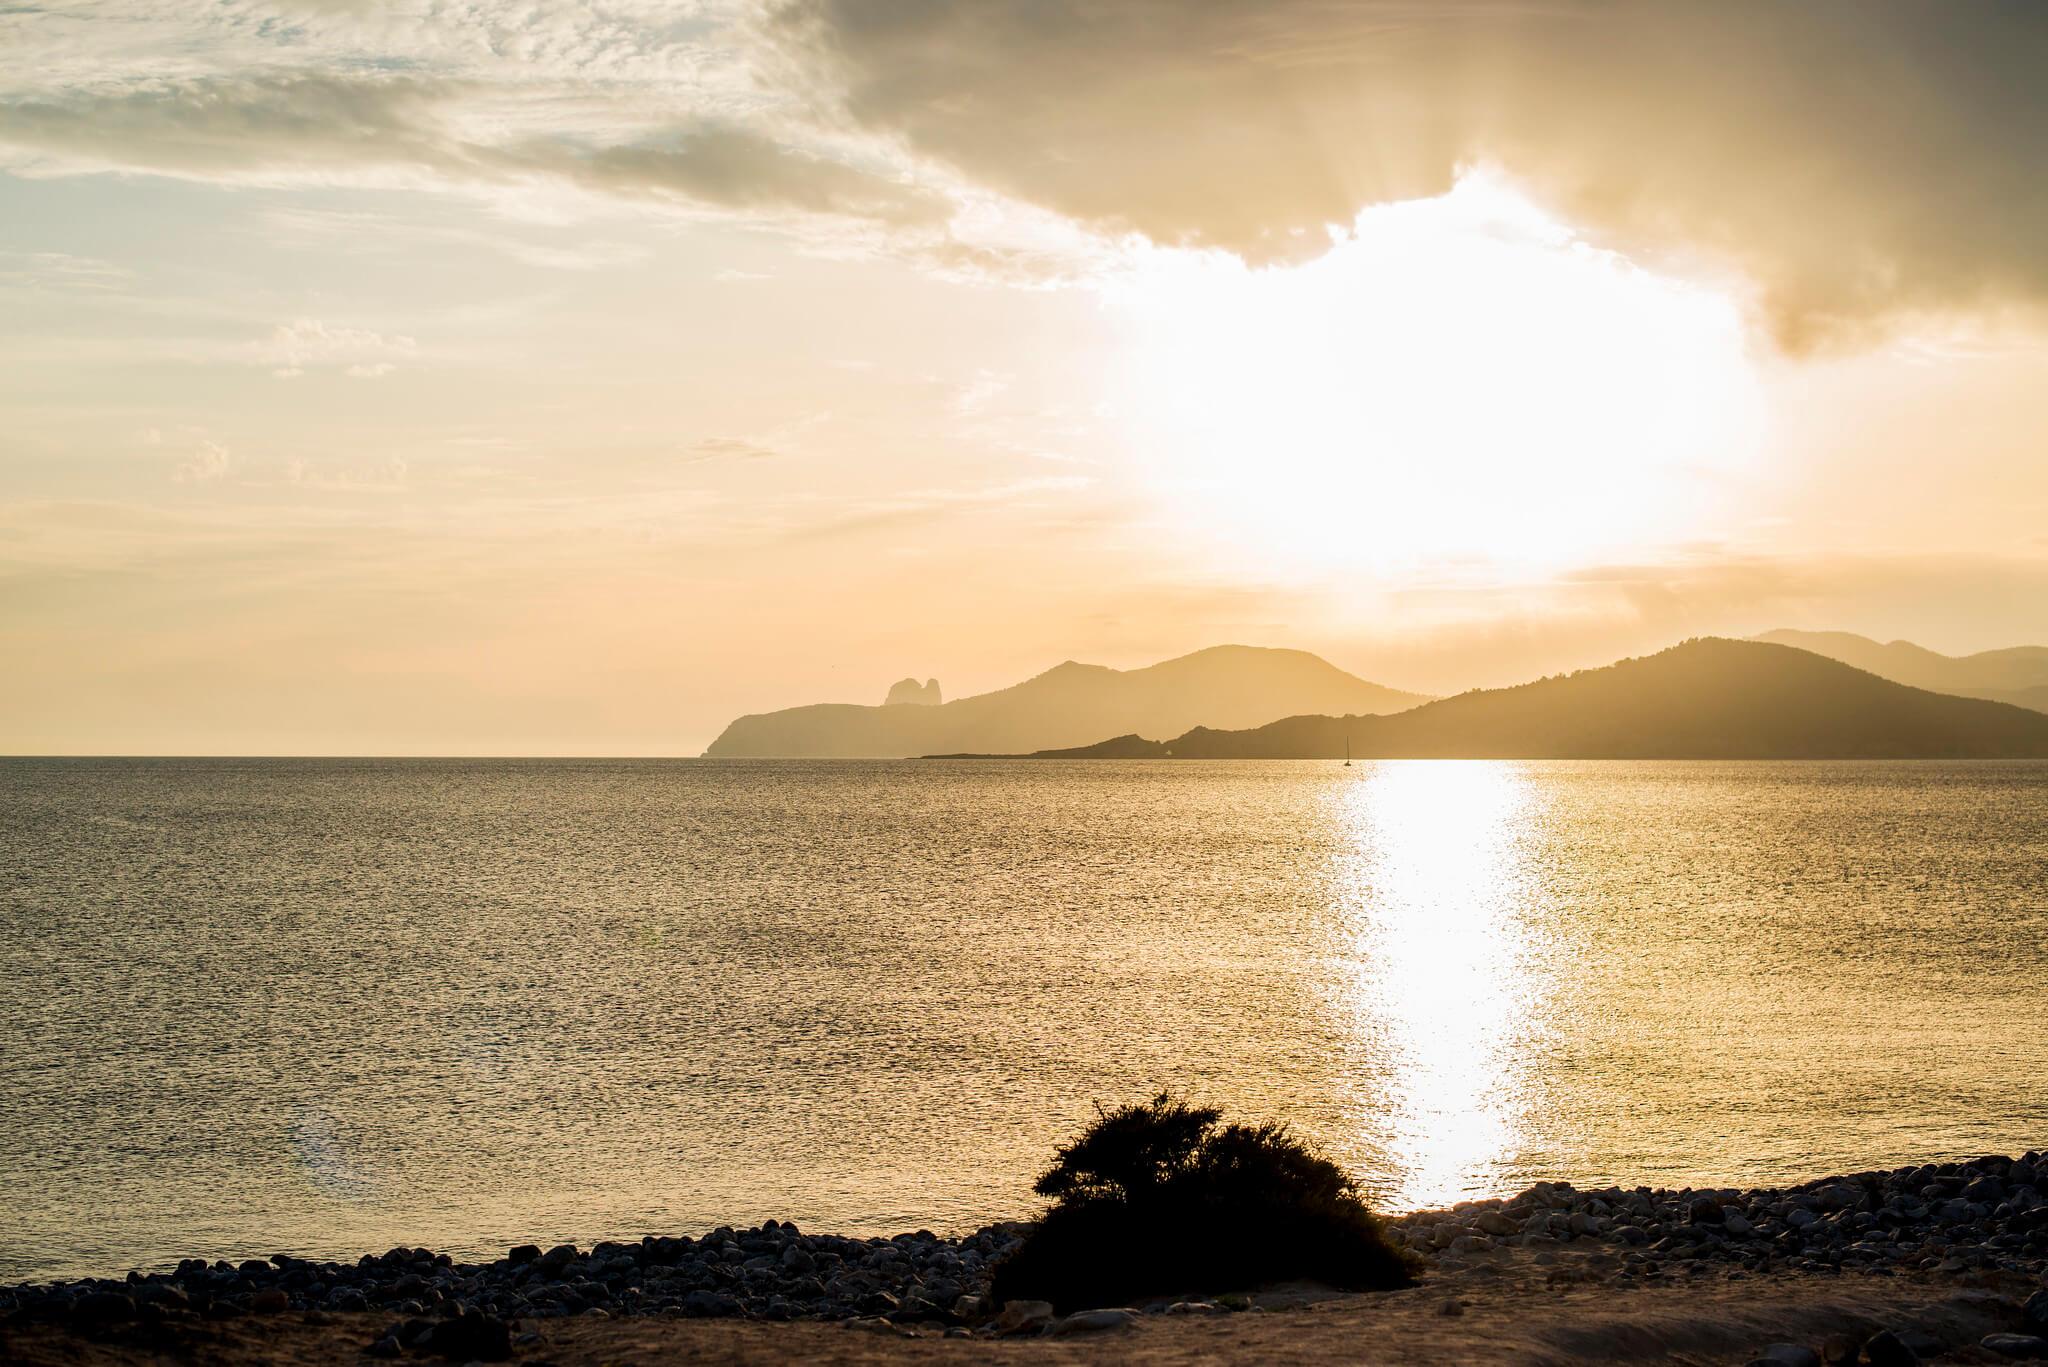 https://www.white-ibiza.com/wp-content/uploads/2020/03/ibiza-sunsets-experimental-beach-ibiza-2020-02.jpg